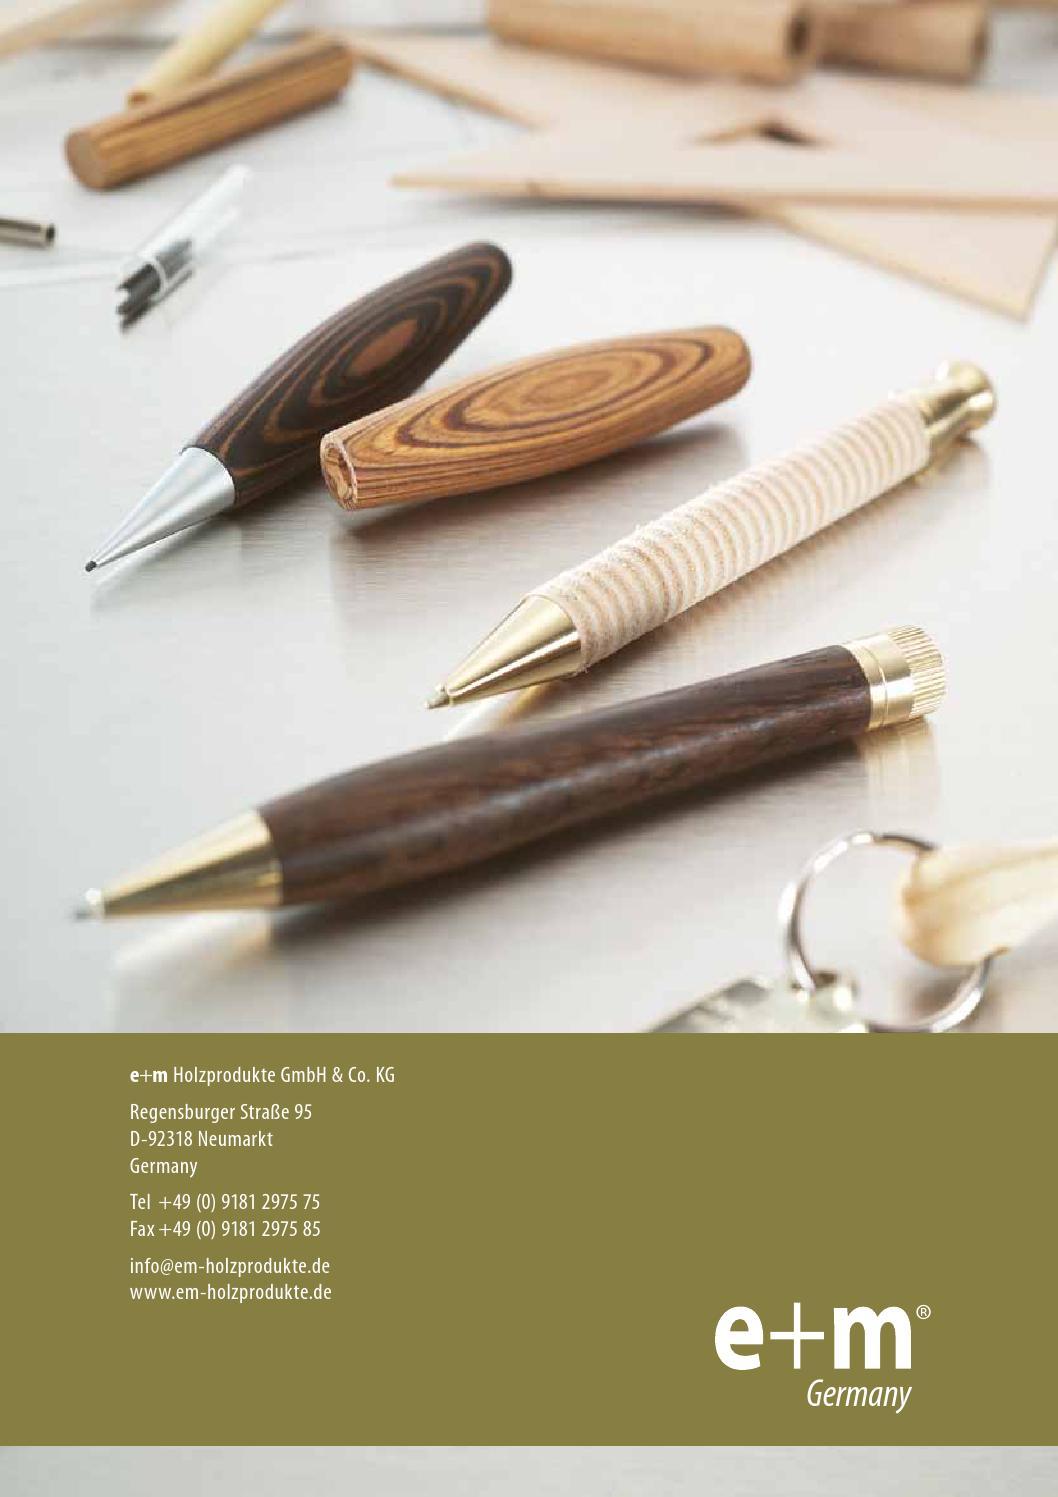 E+M Germany Maximo Wood Pencil Extender GS 25-48 Light Oak